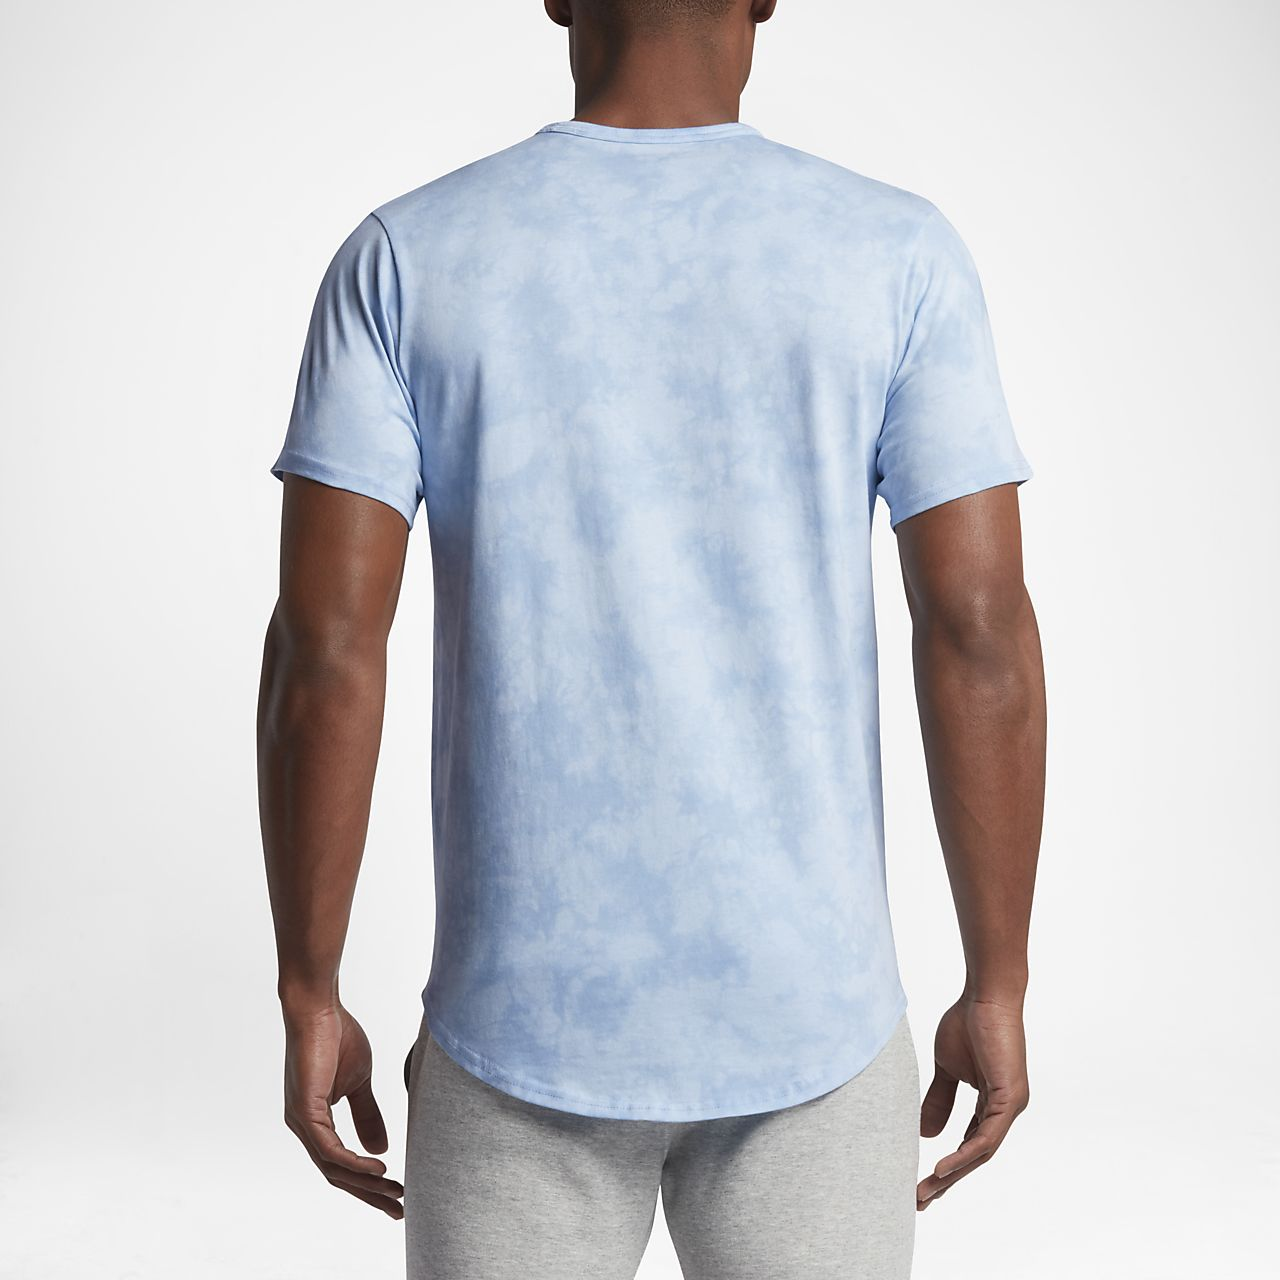 e1bdf1c722e0 Jordan 23 True Fadeaway Men s T-Shirt. Nike.com IN